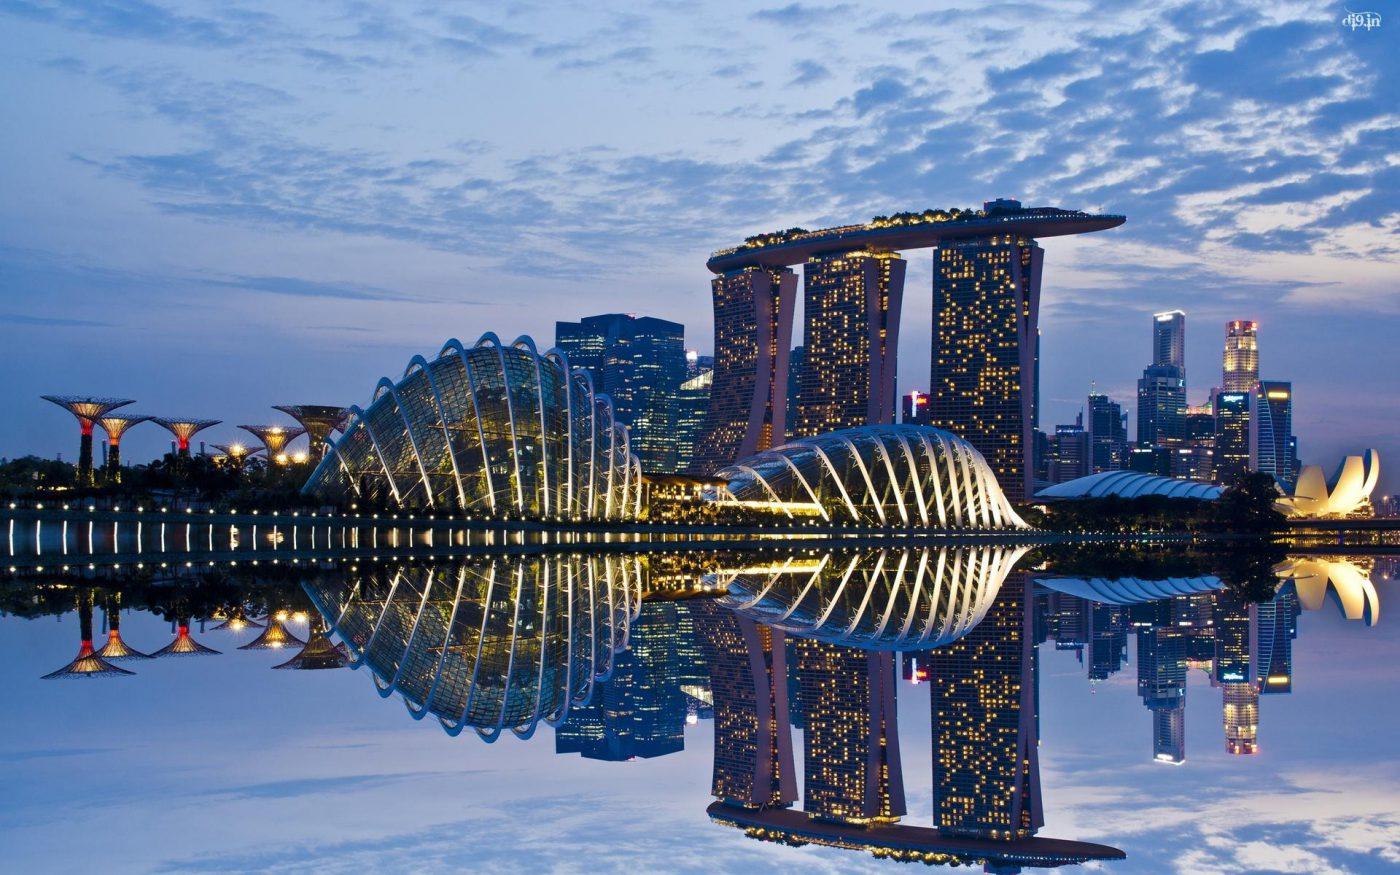 hey-backpacker-ini-dia-rekomendasi-hostel-murah-untuk-backpacker-di-singapura